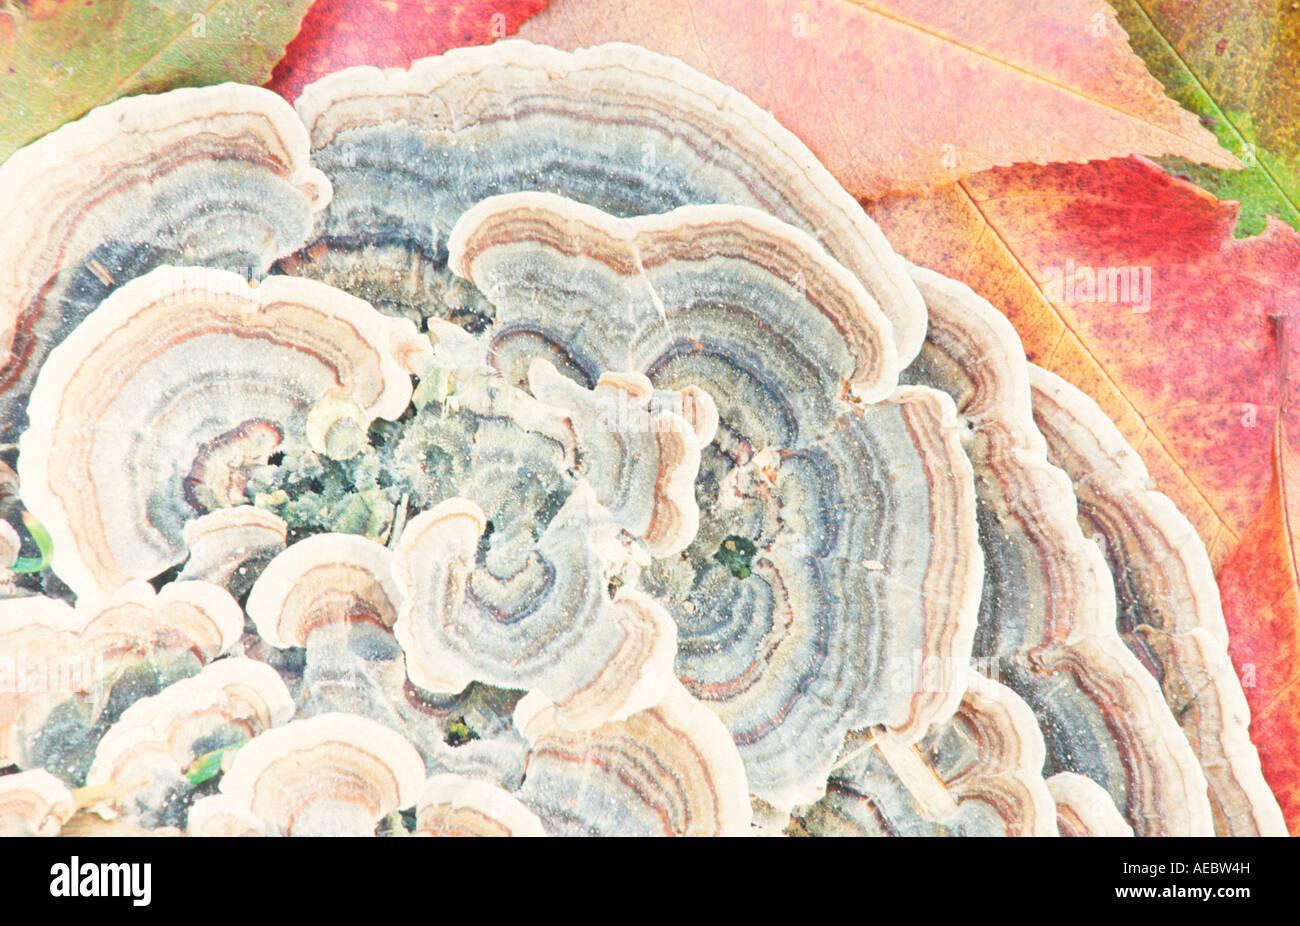 Turquía mushroom en Edgartown MA Imagen De Stock